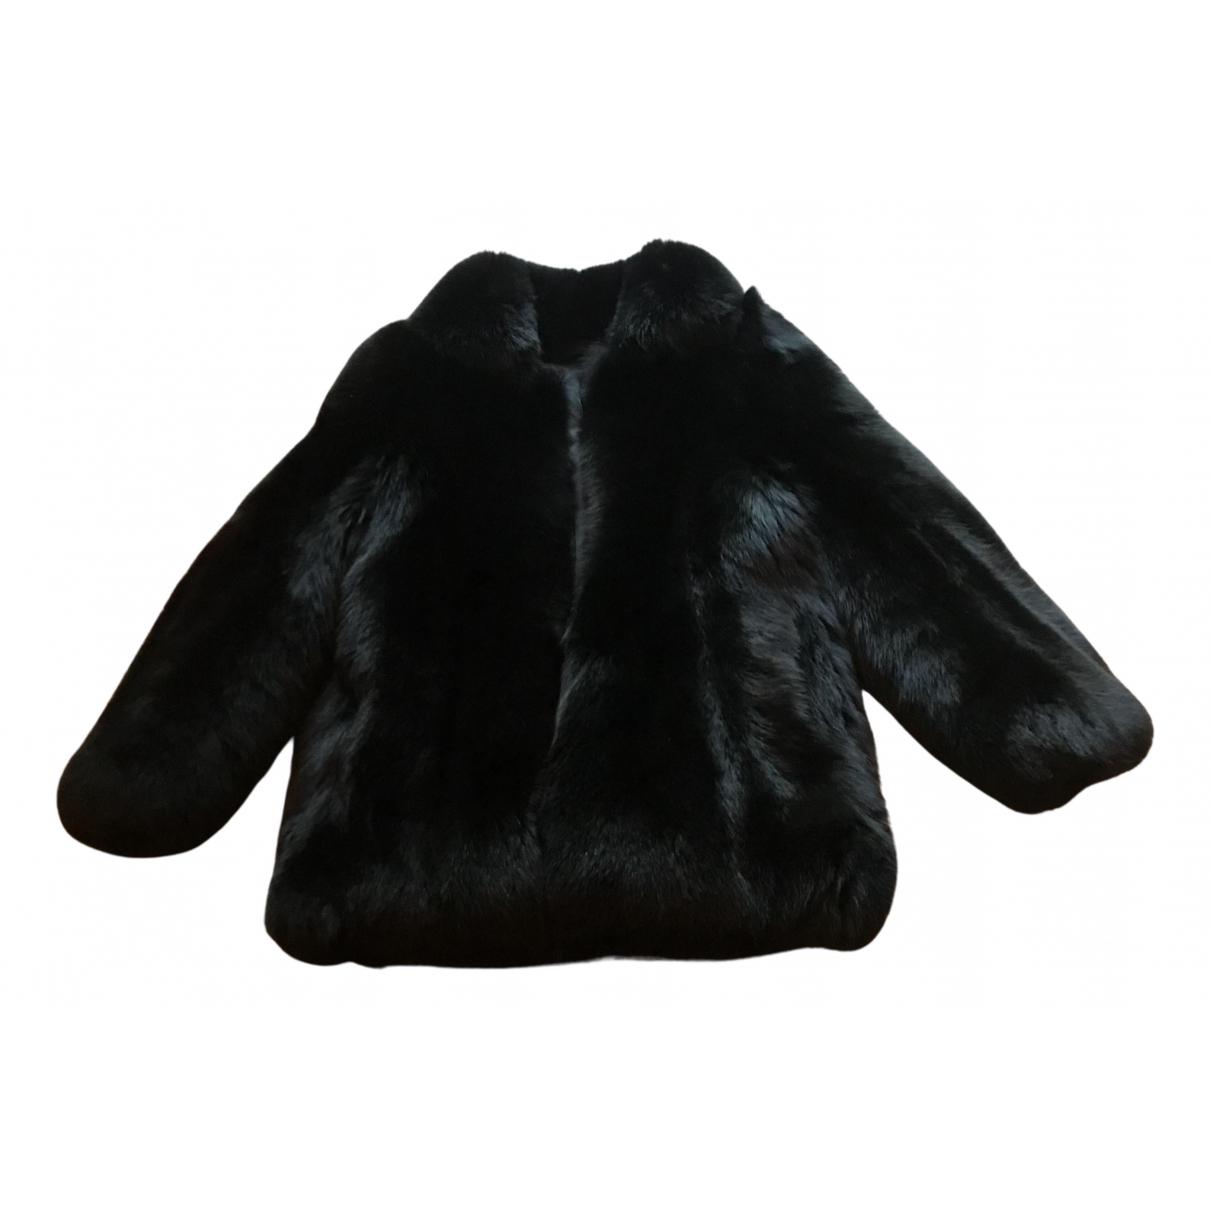 Rta \N Black Fox jacket for Women XS International